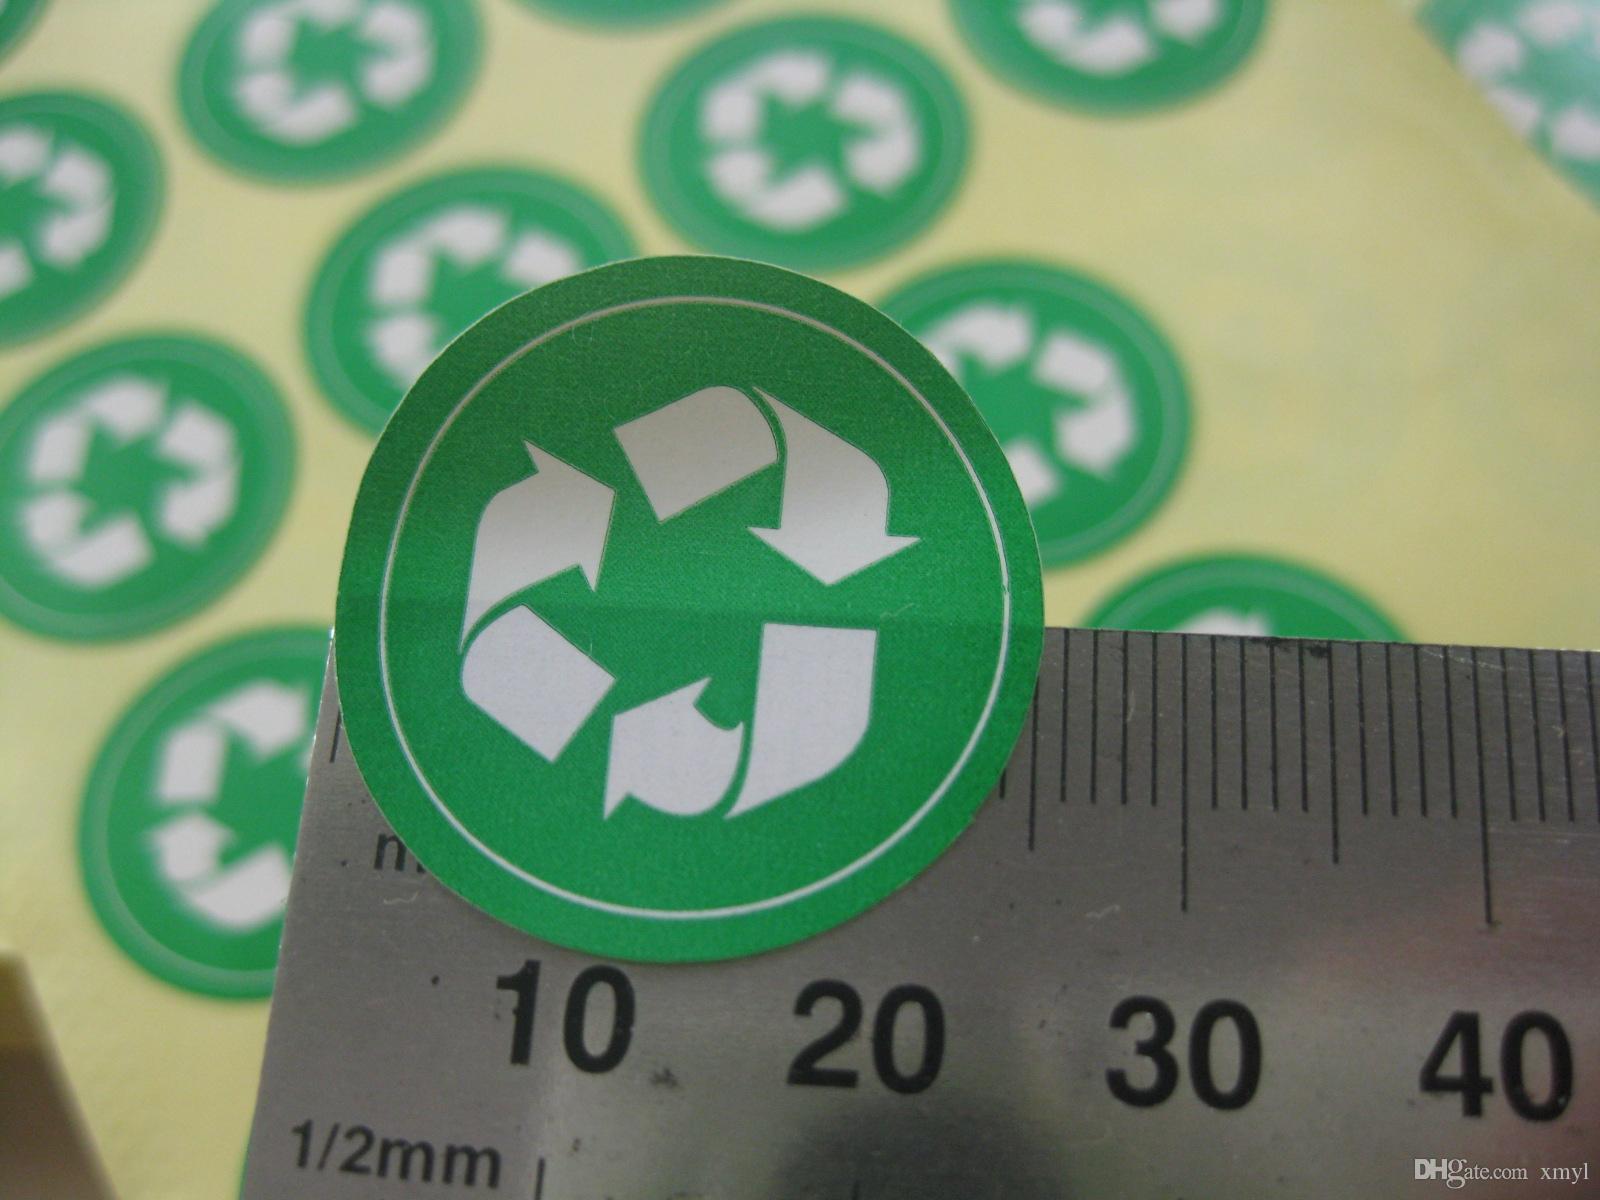 1000 шт. / Компл. 25 мм RECYCLE символ, знак охраны окружающей среды, зеленый цвет самоклеящаяся наклейка, артикул №GU15